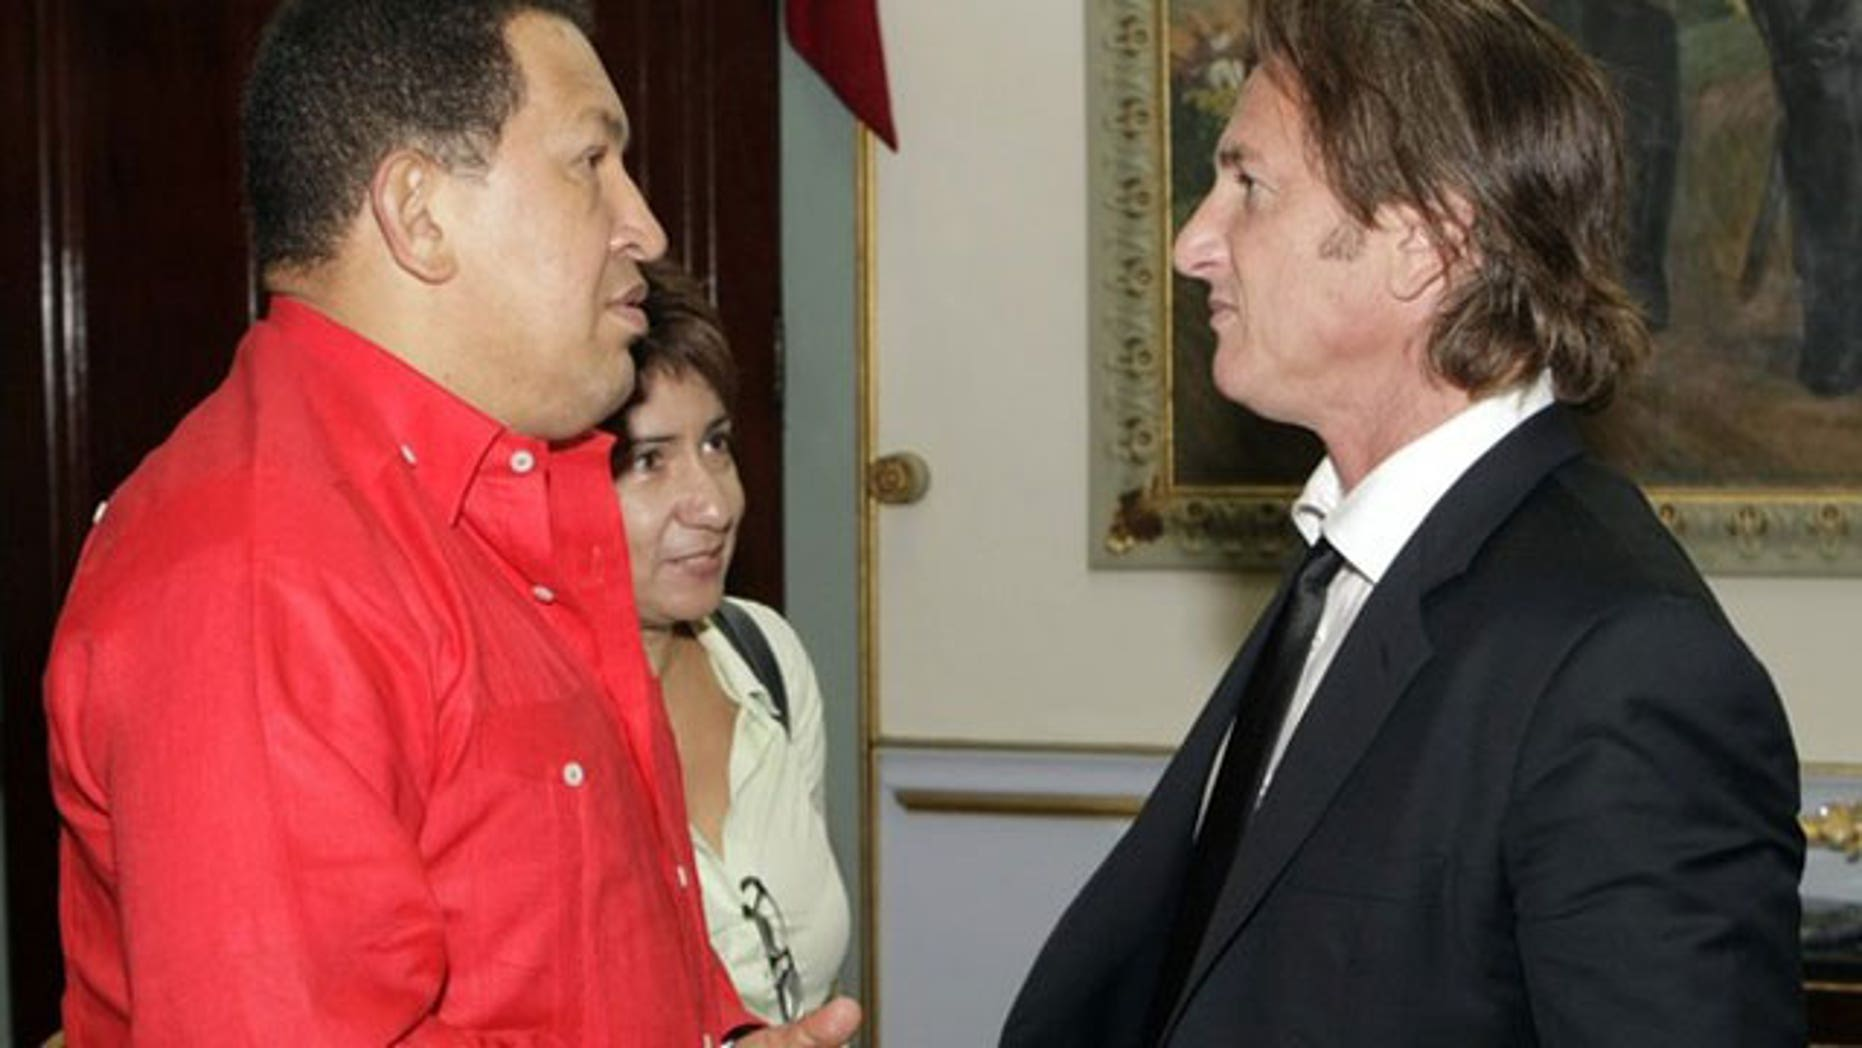 Oct. 2009: Sean Penn (r) chats with Venezuelan President Hugo Chavez at Miraflores Palace in Caracas.